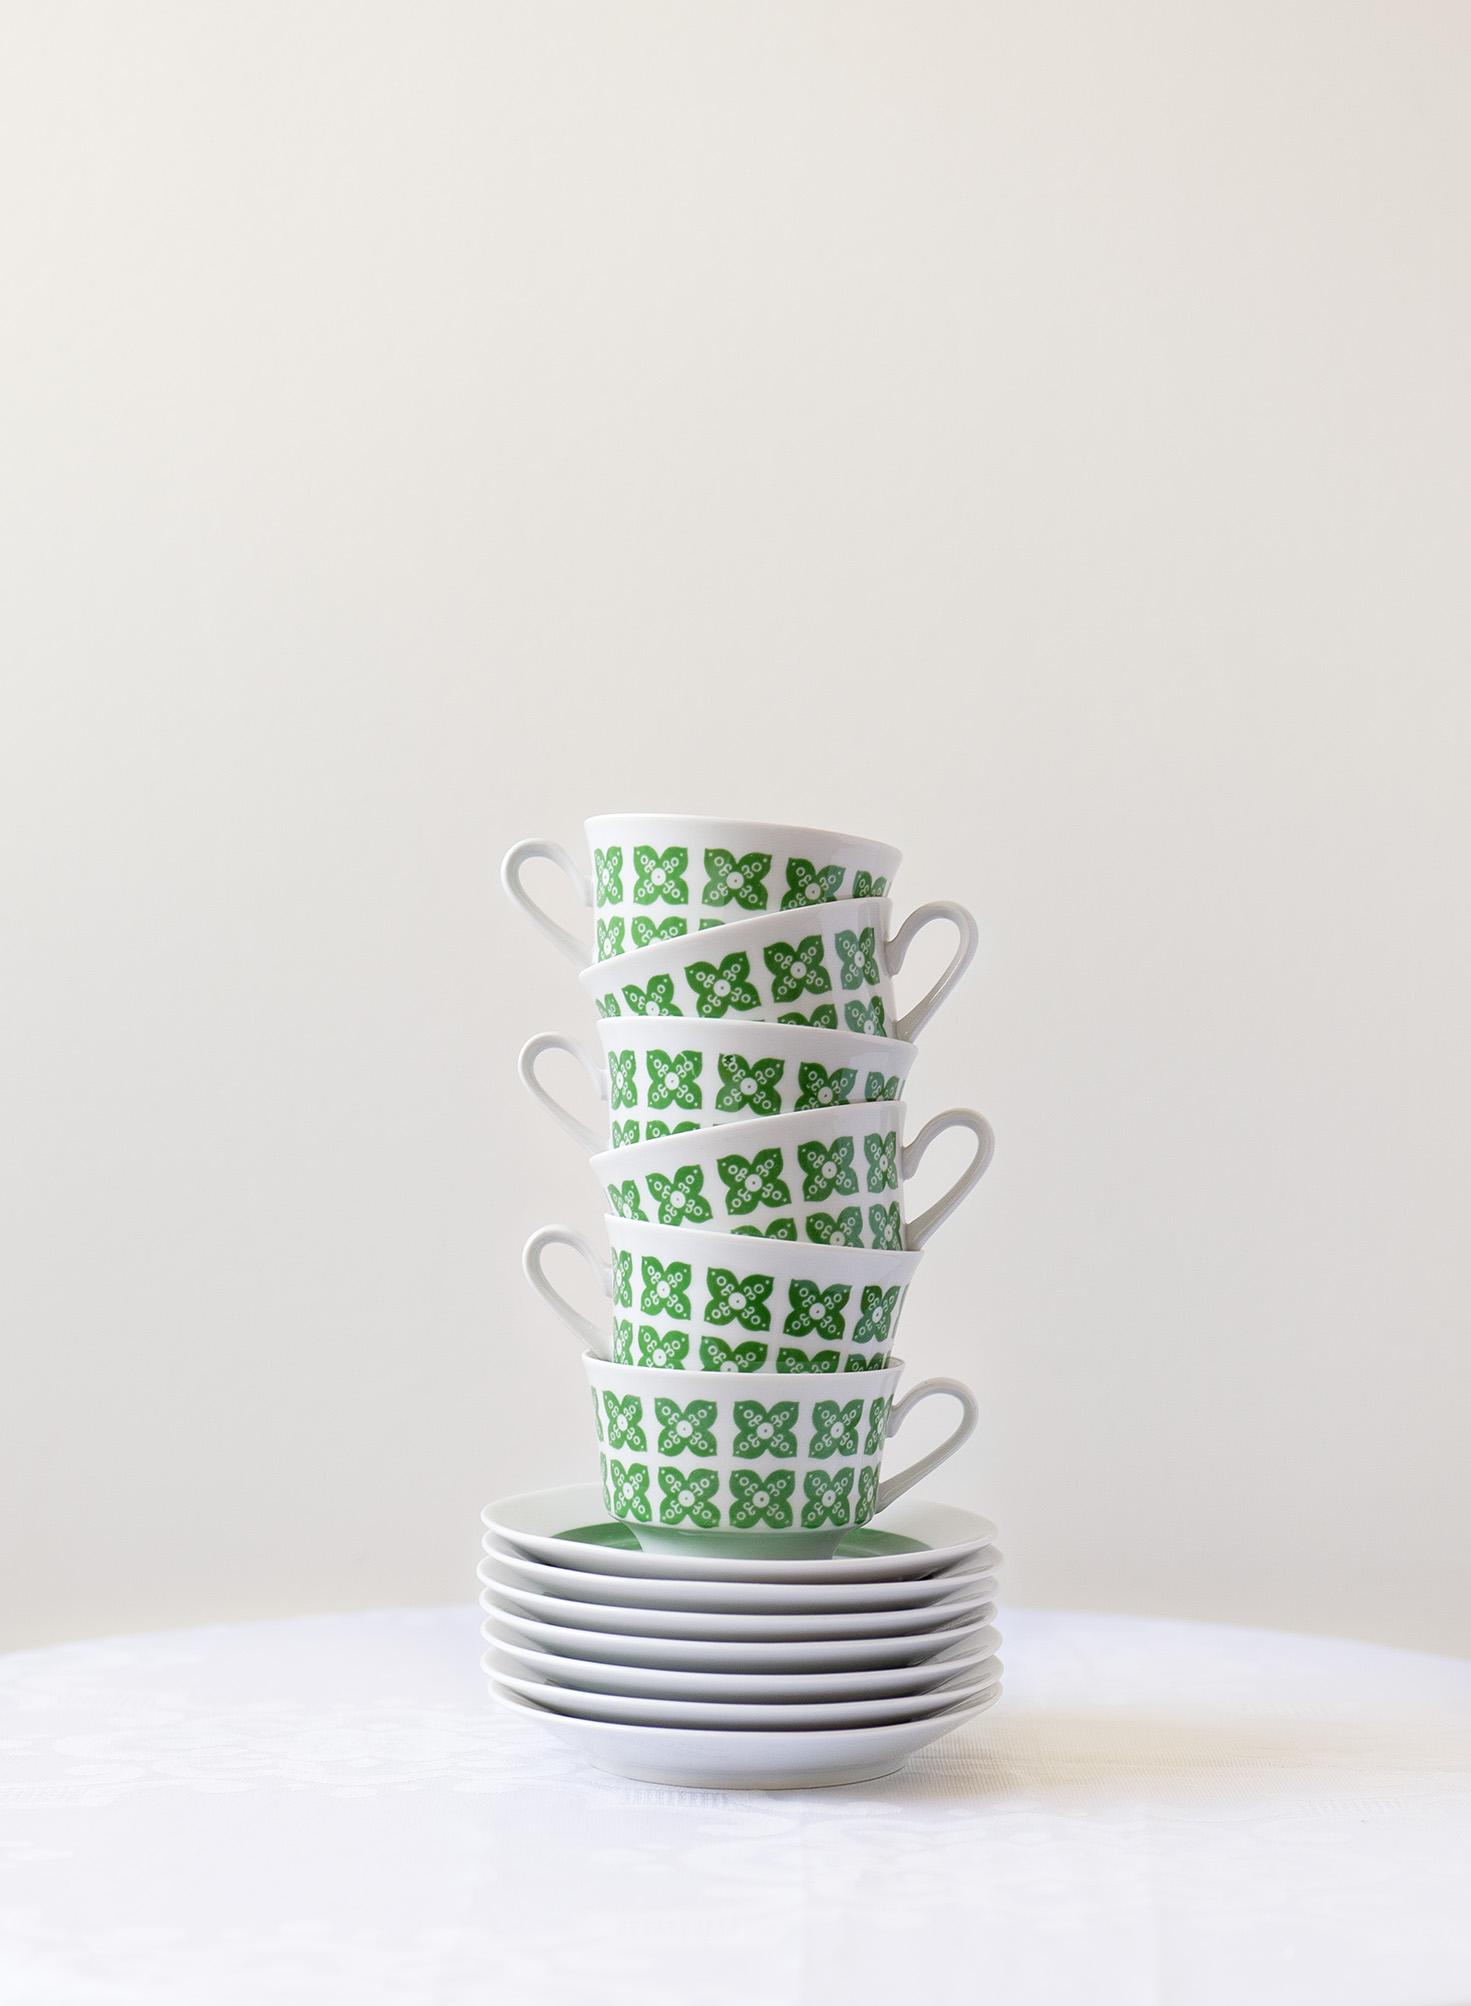 jenny rafalson_Russian porcelain3.jpg